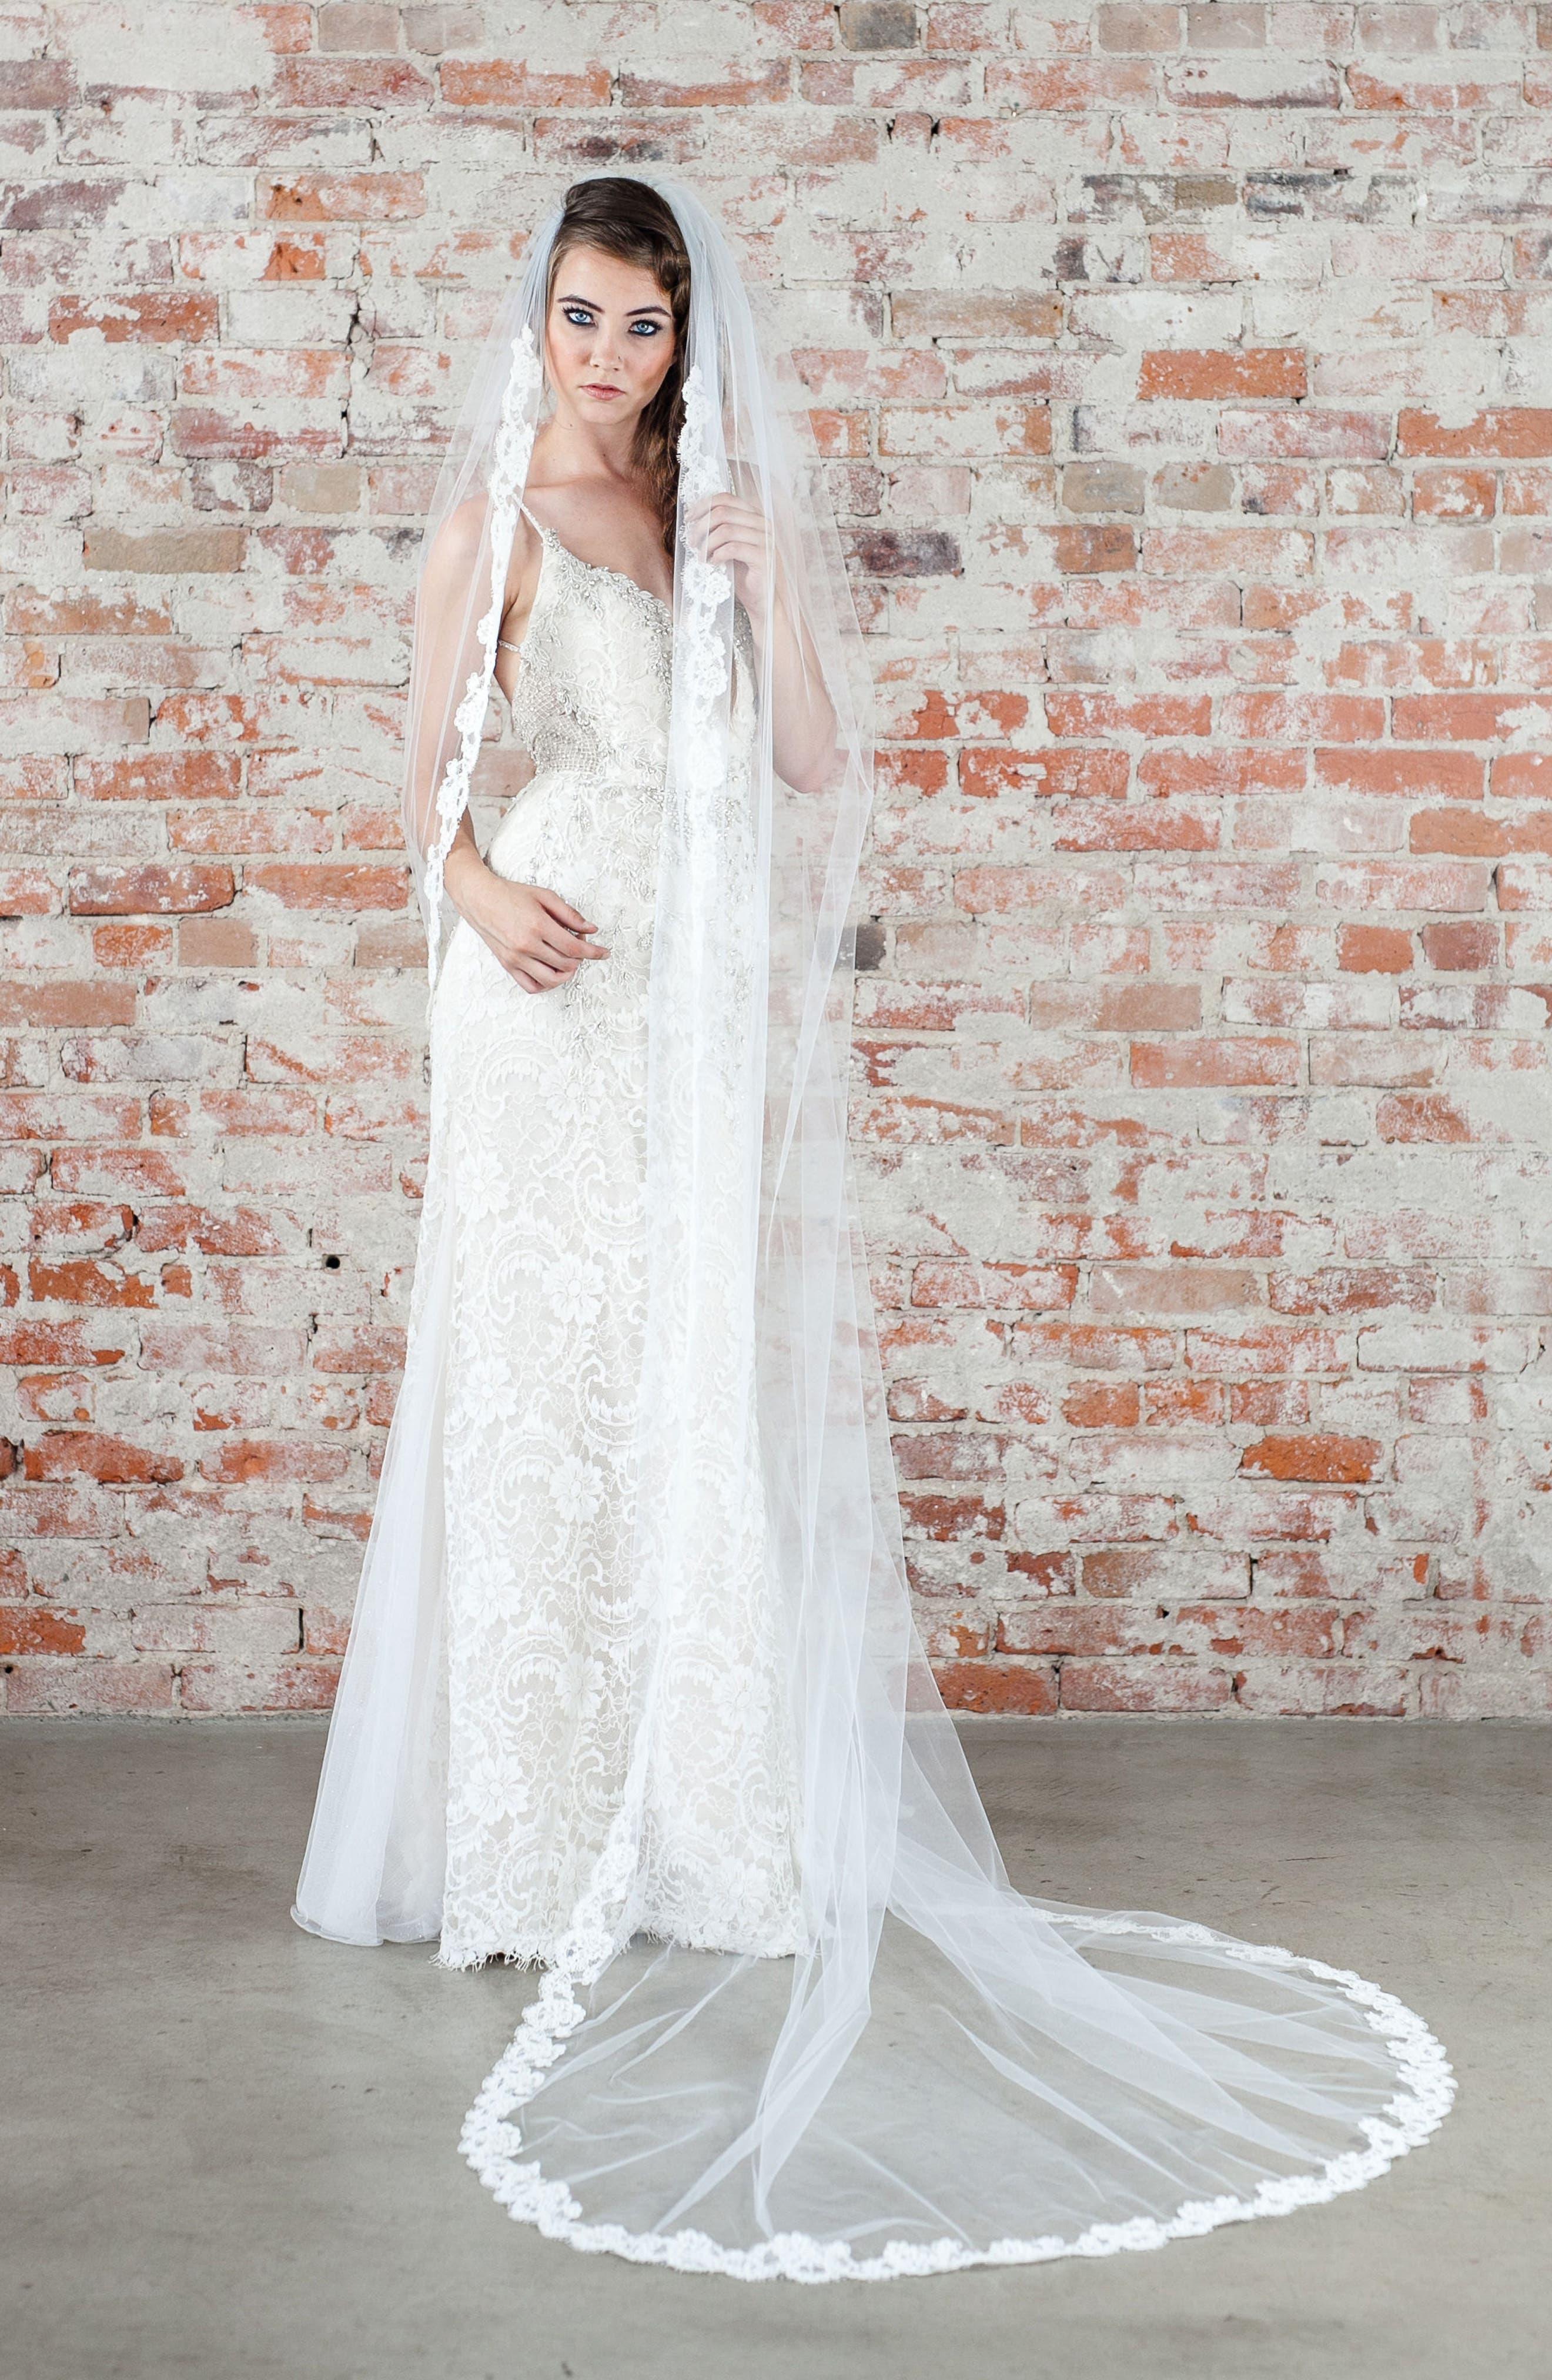 Veil Trends Carnation Bridal Veil